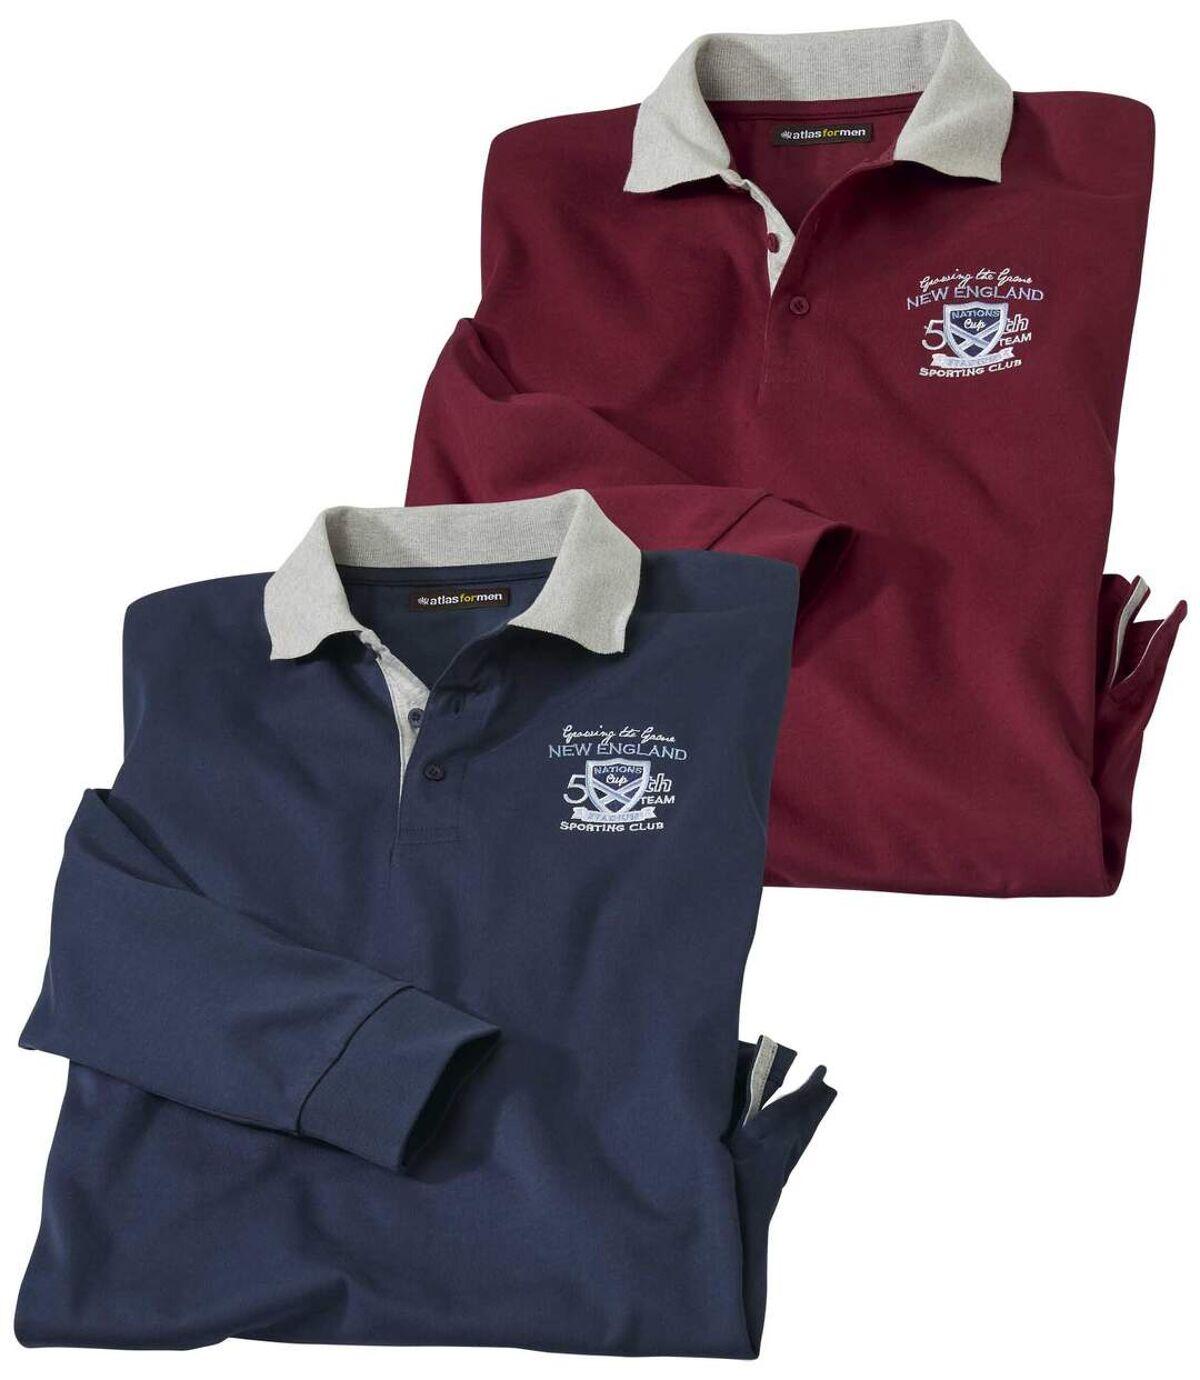 Sada 2 polo triček Sporting Club Atlas For Men